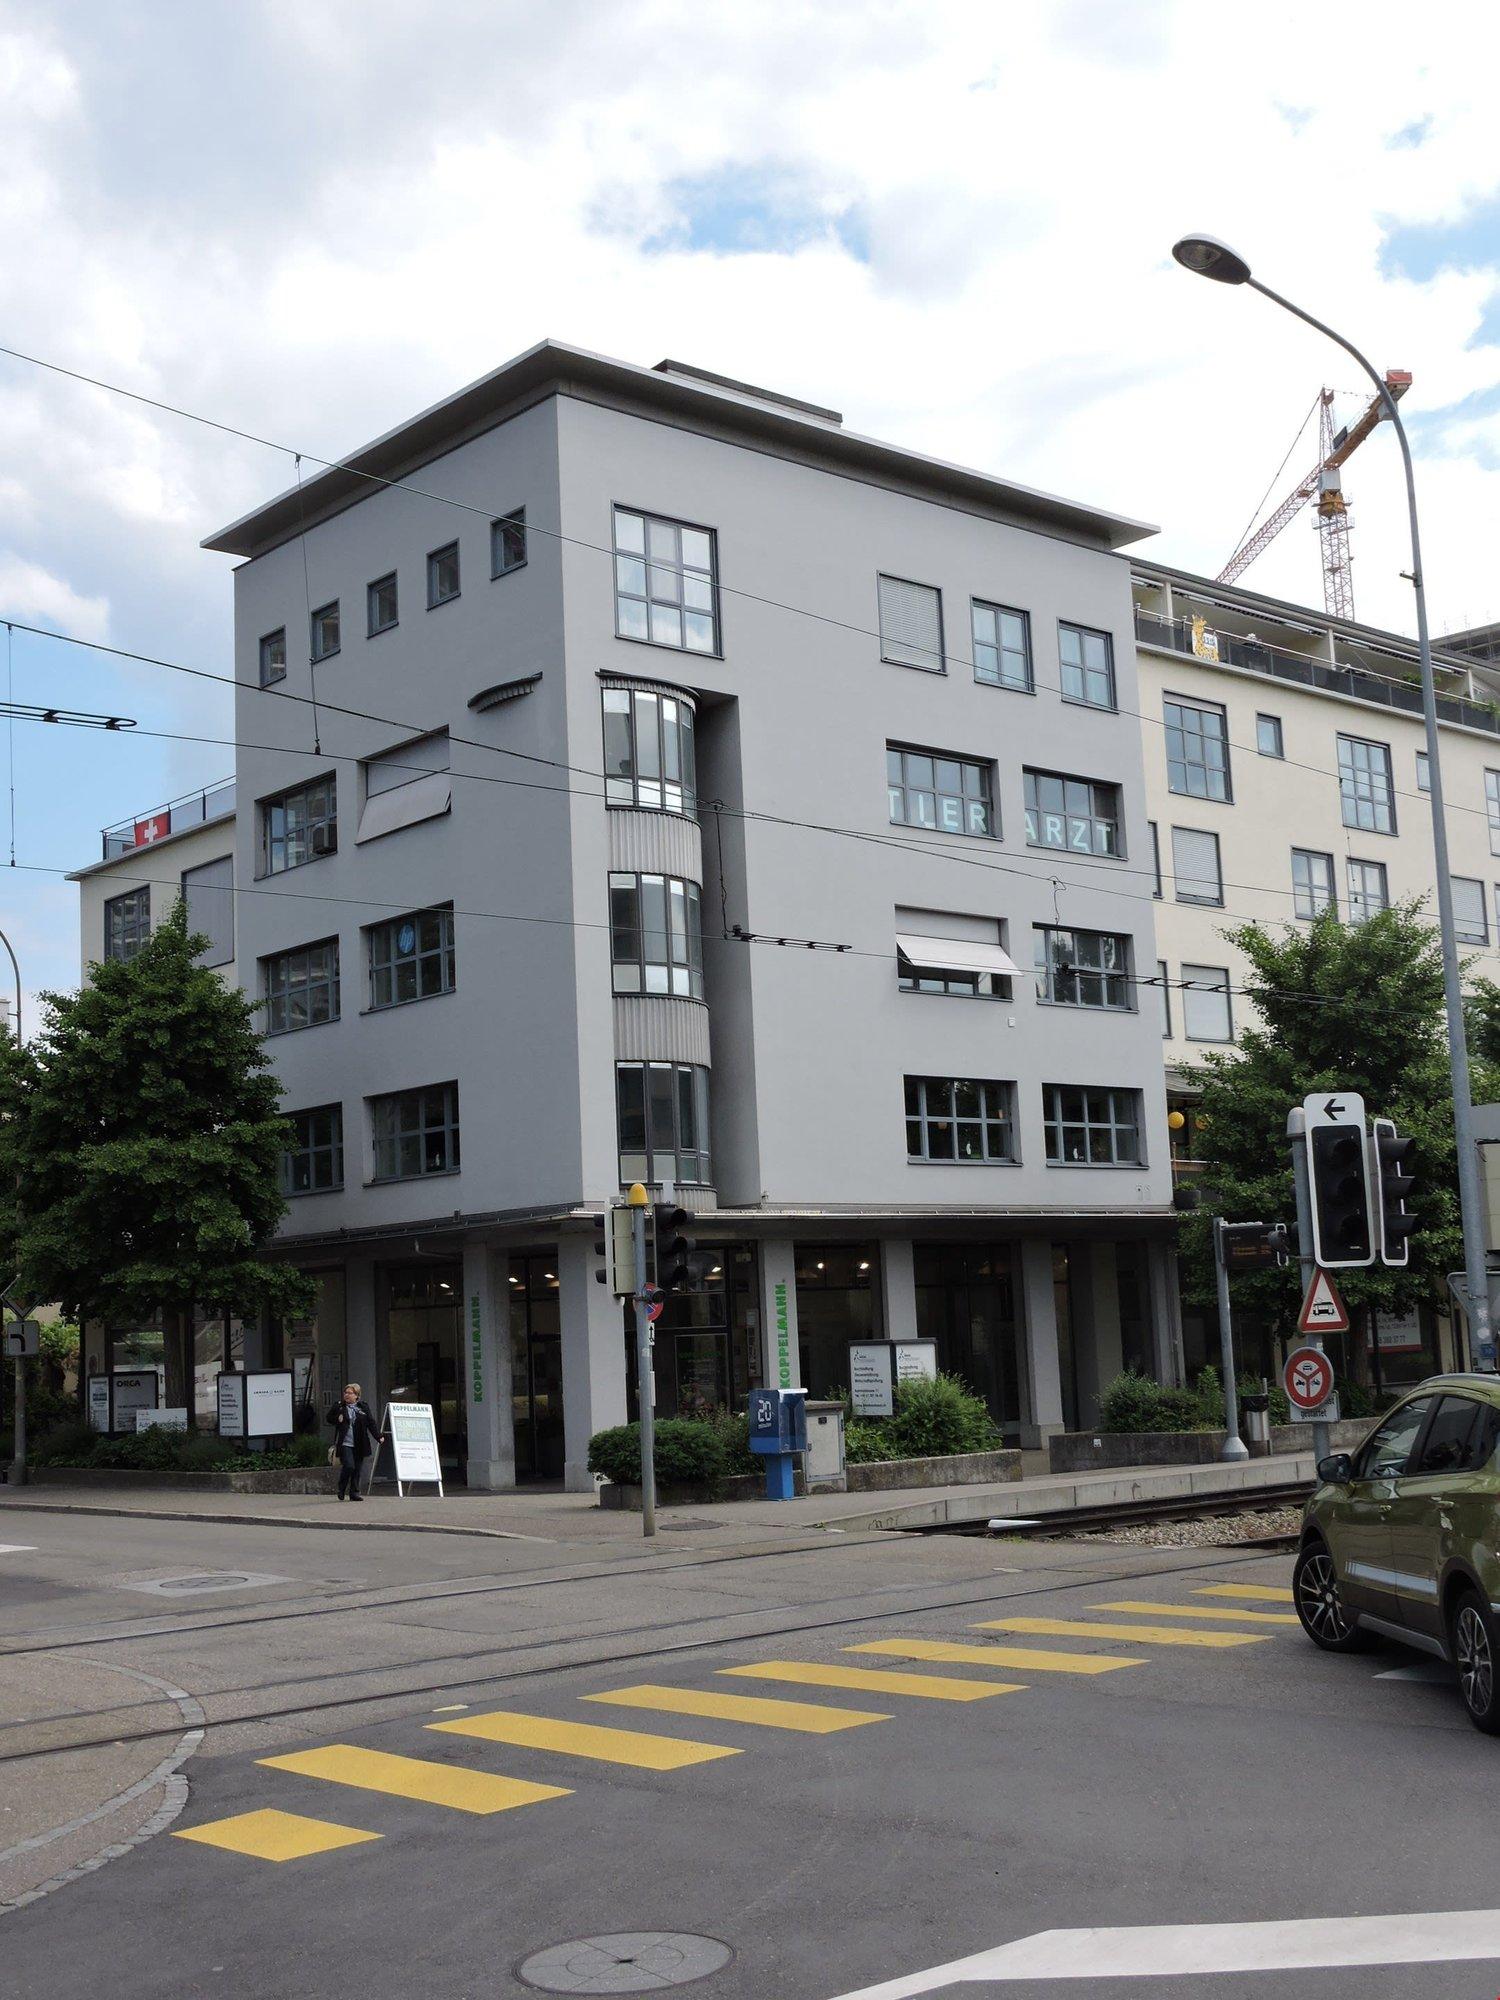 Bahnhofstrasse 11